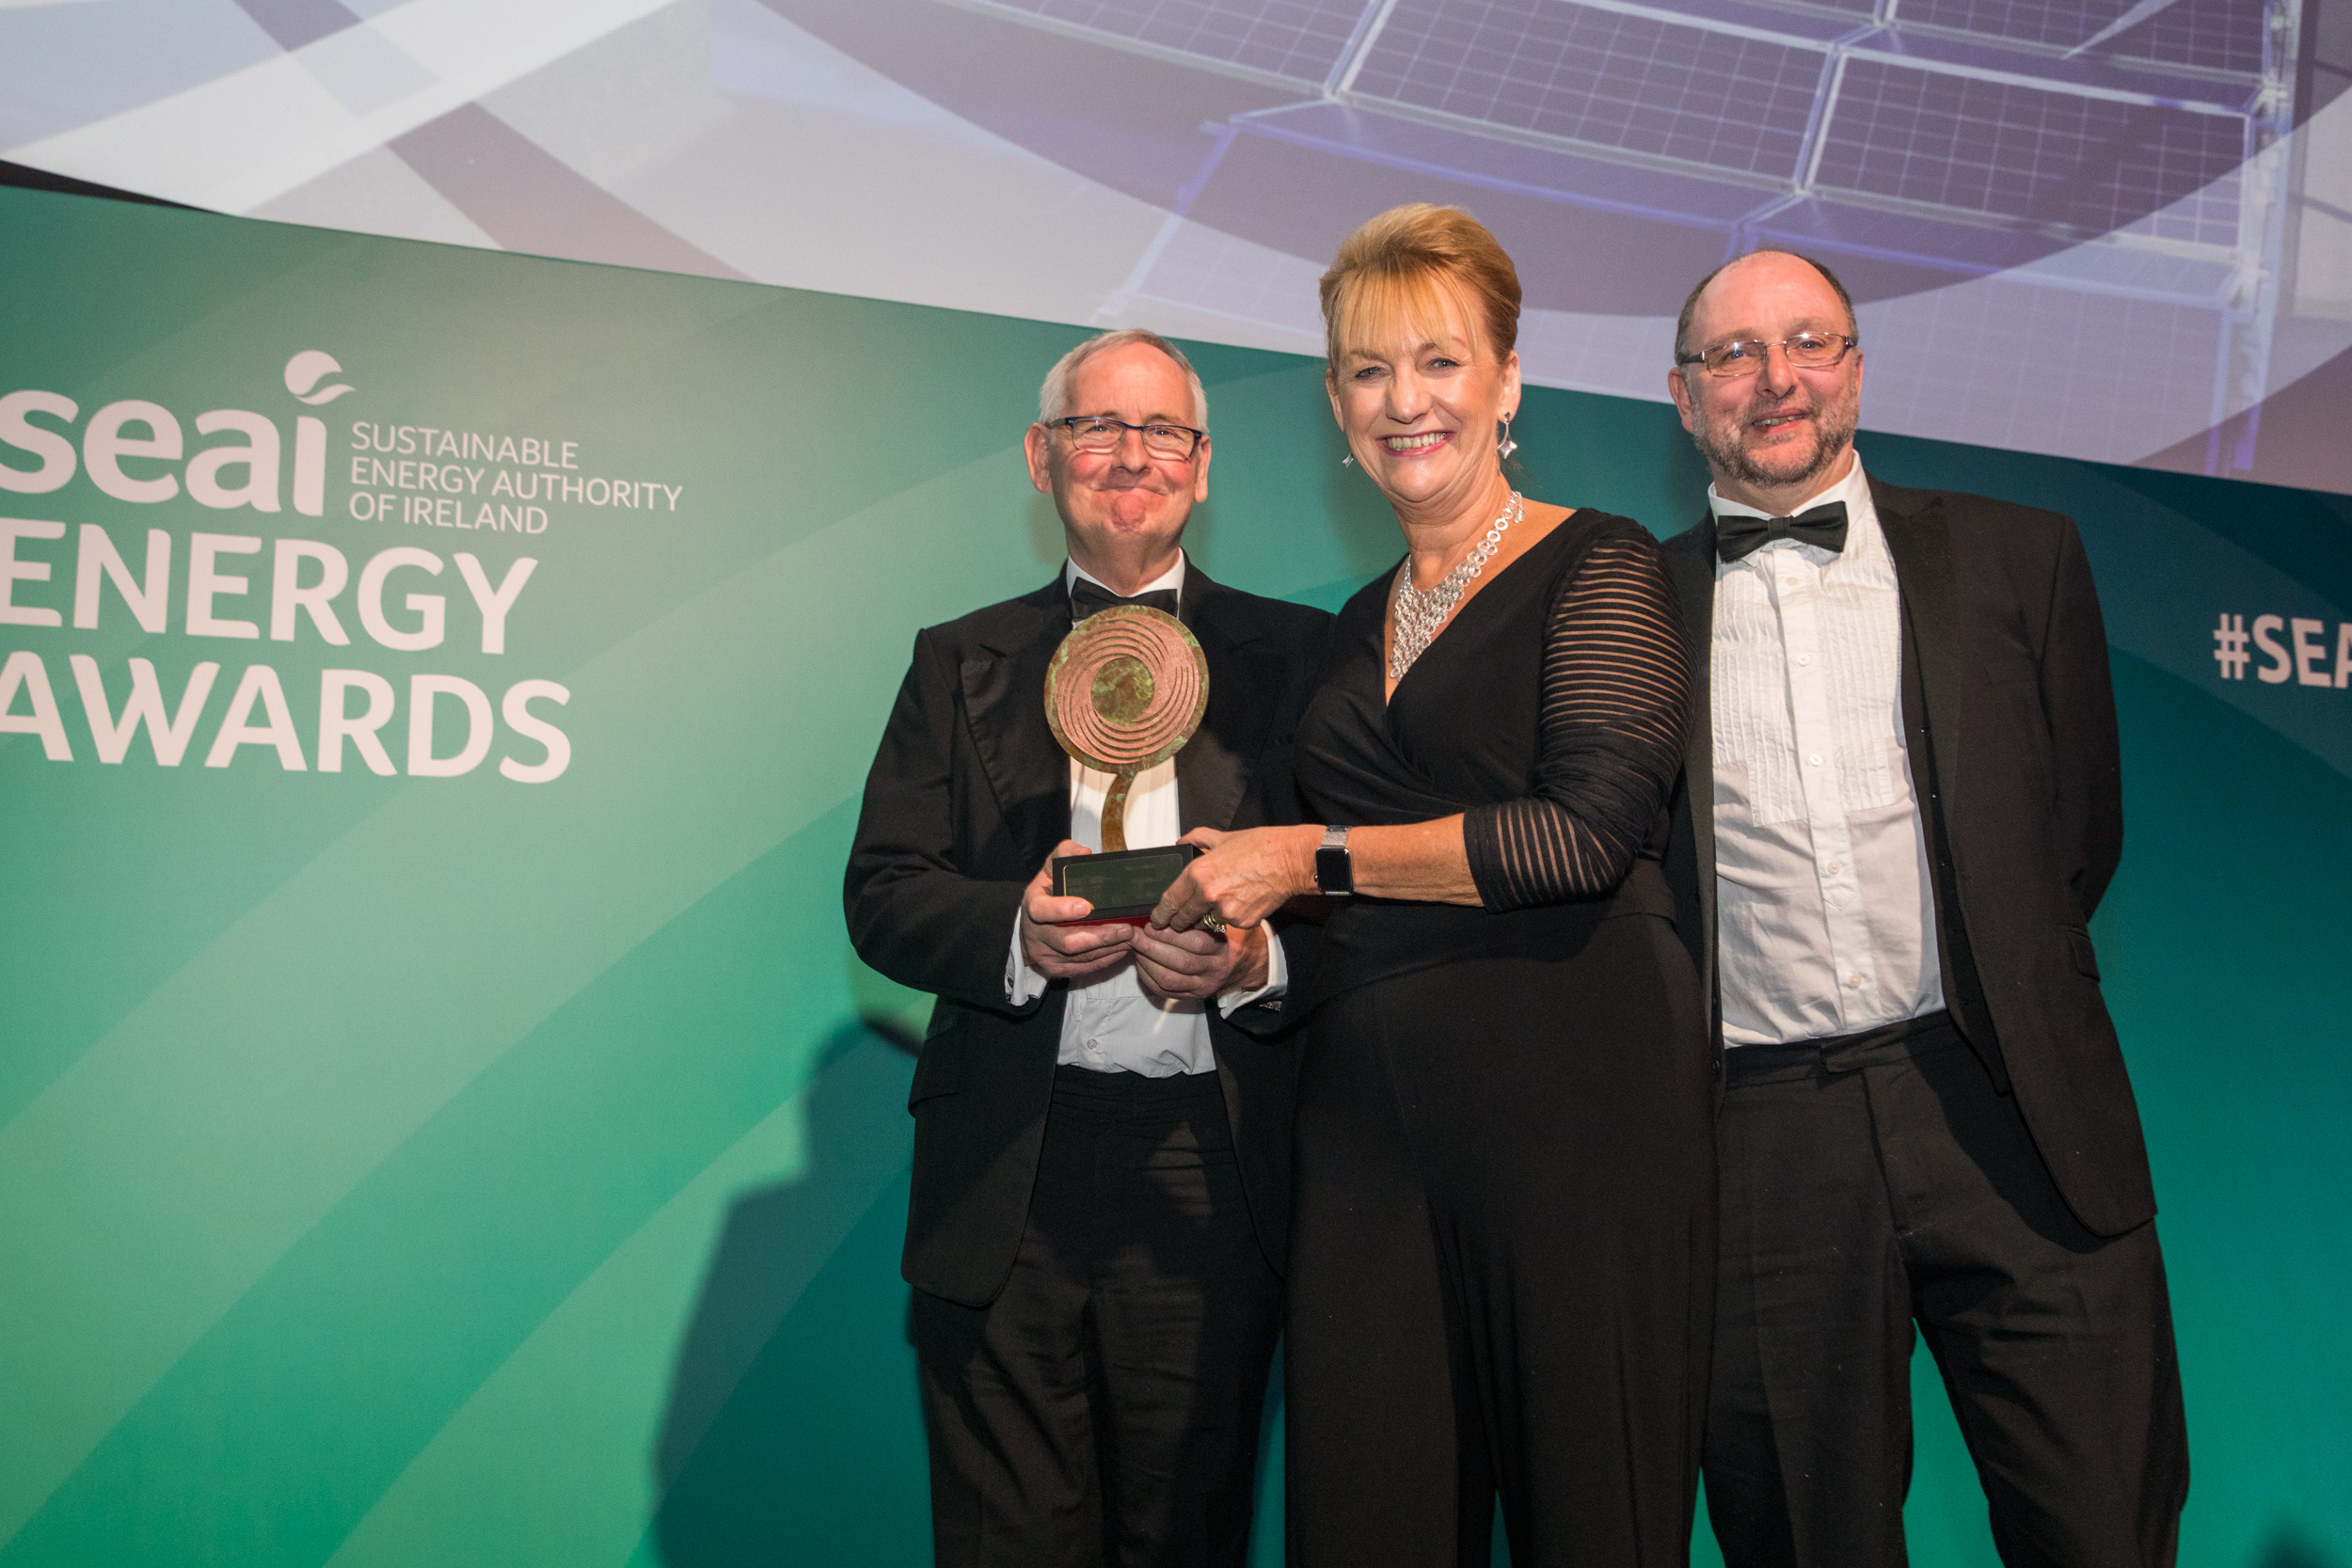 SEAI Energy Awards Research Winner MPOWER 2018